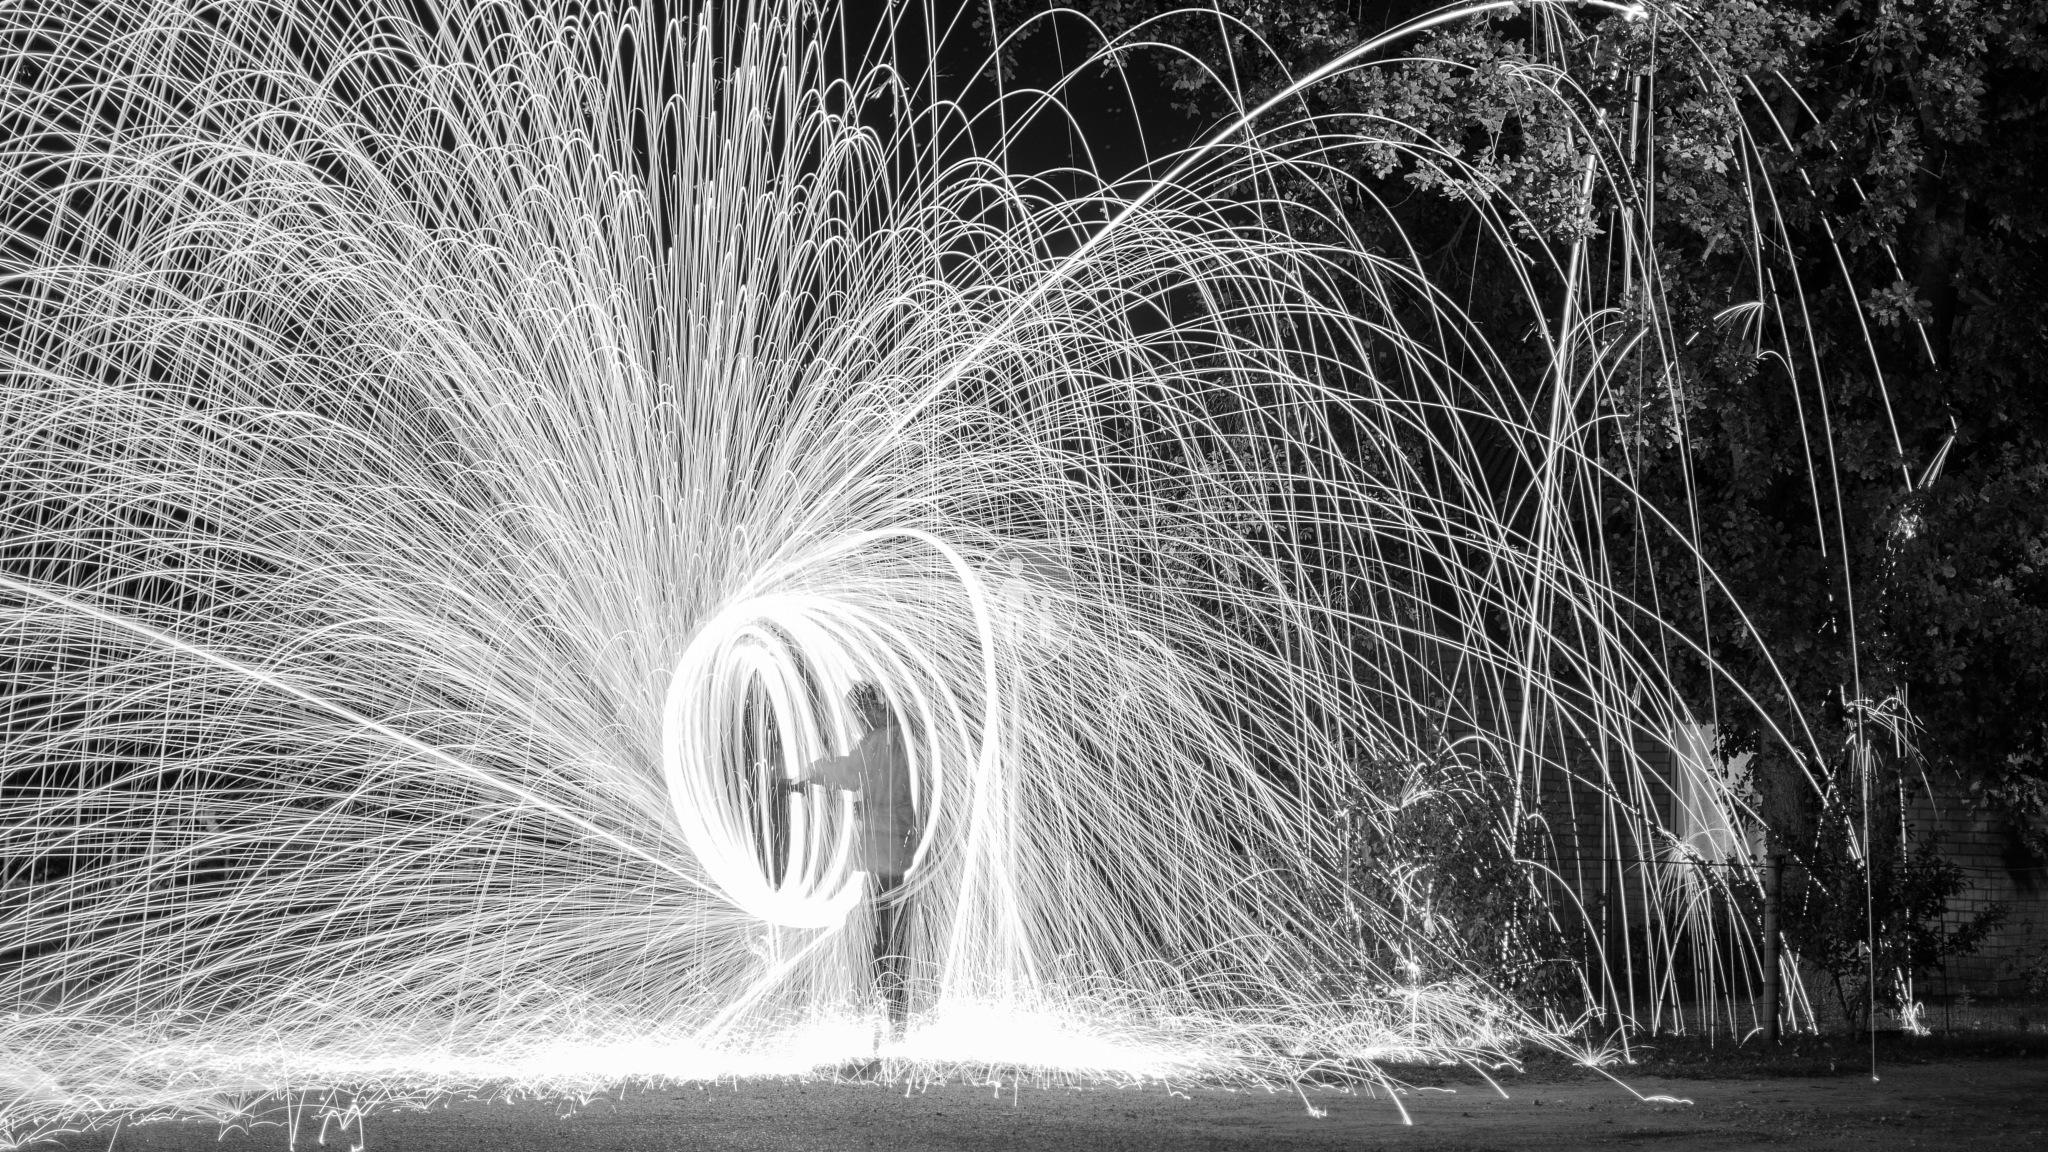 Steelwool long exposure by rytiss50